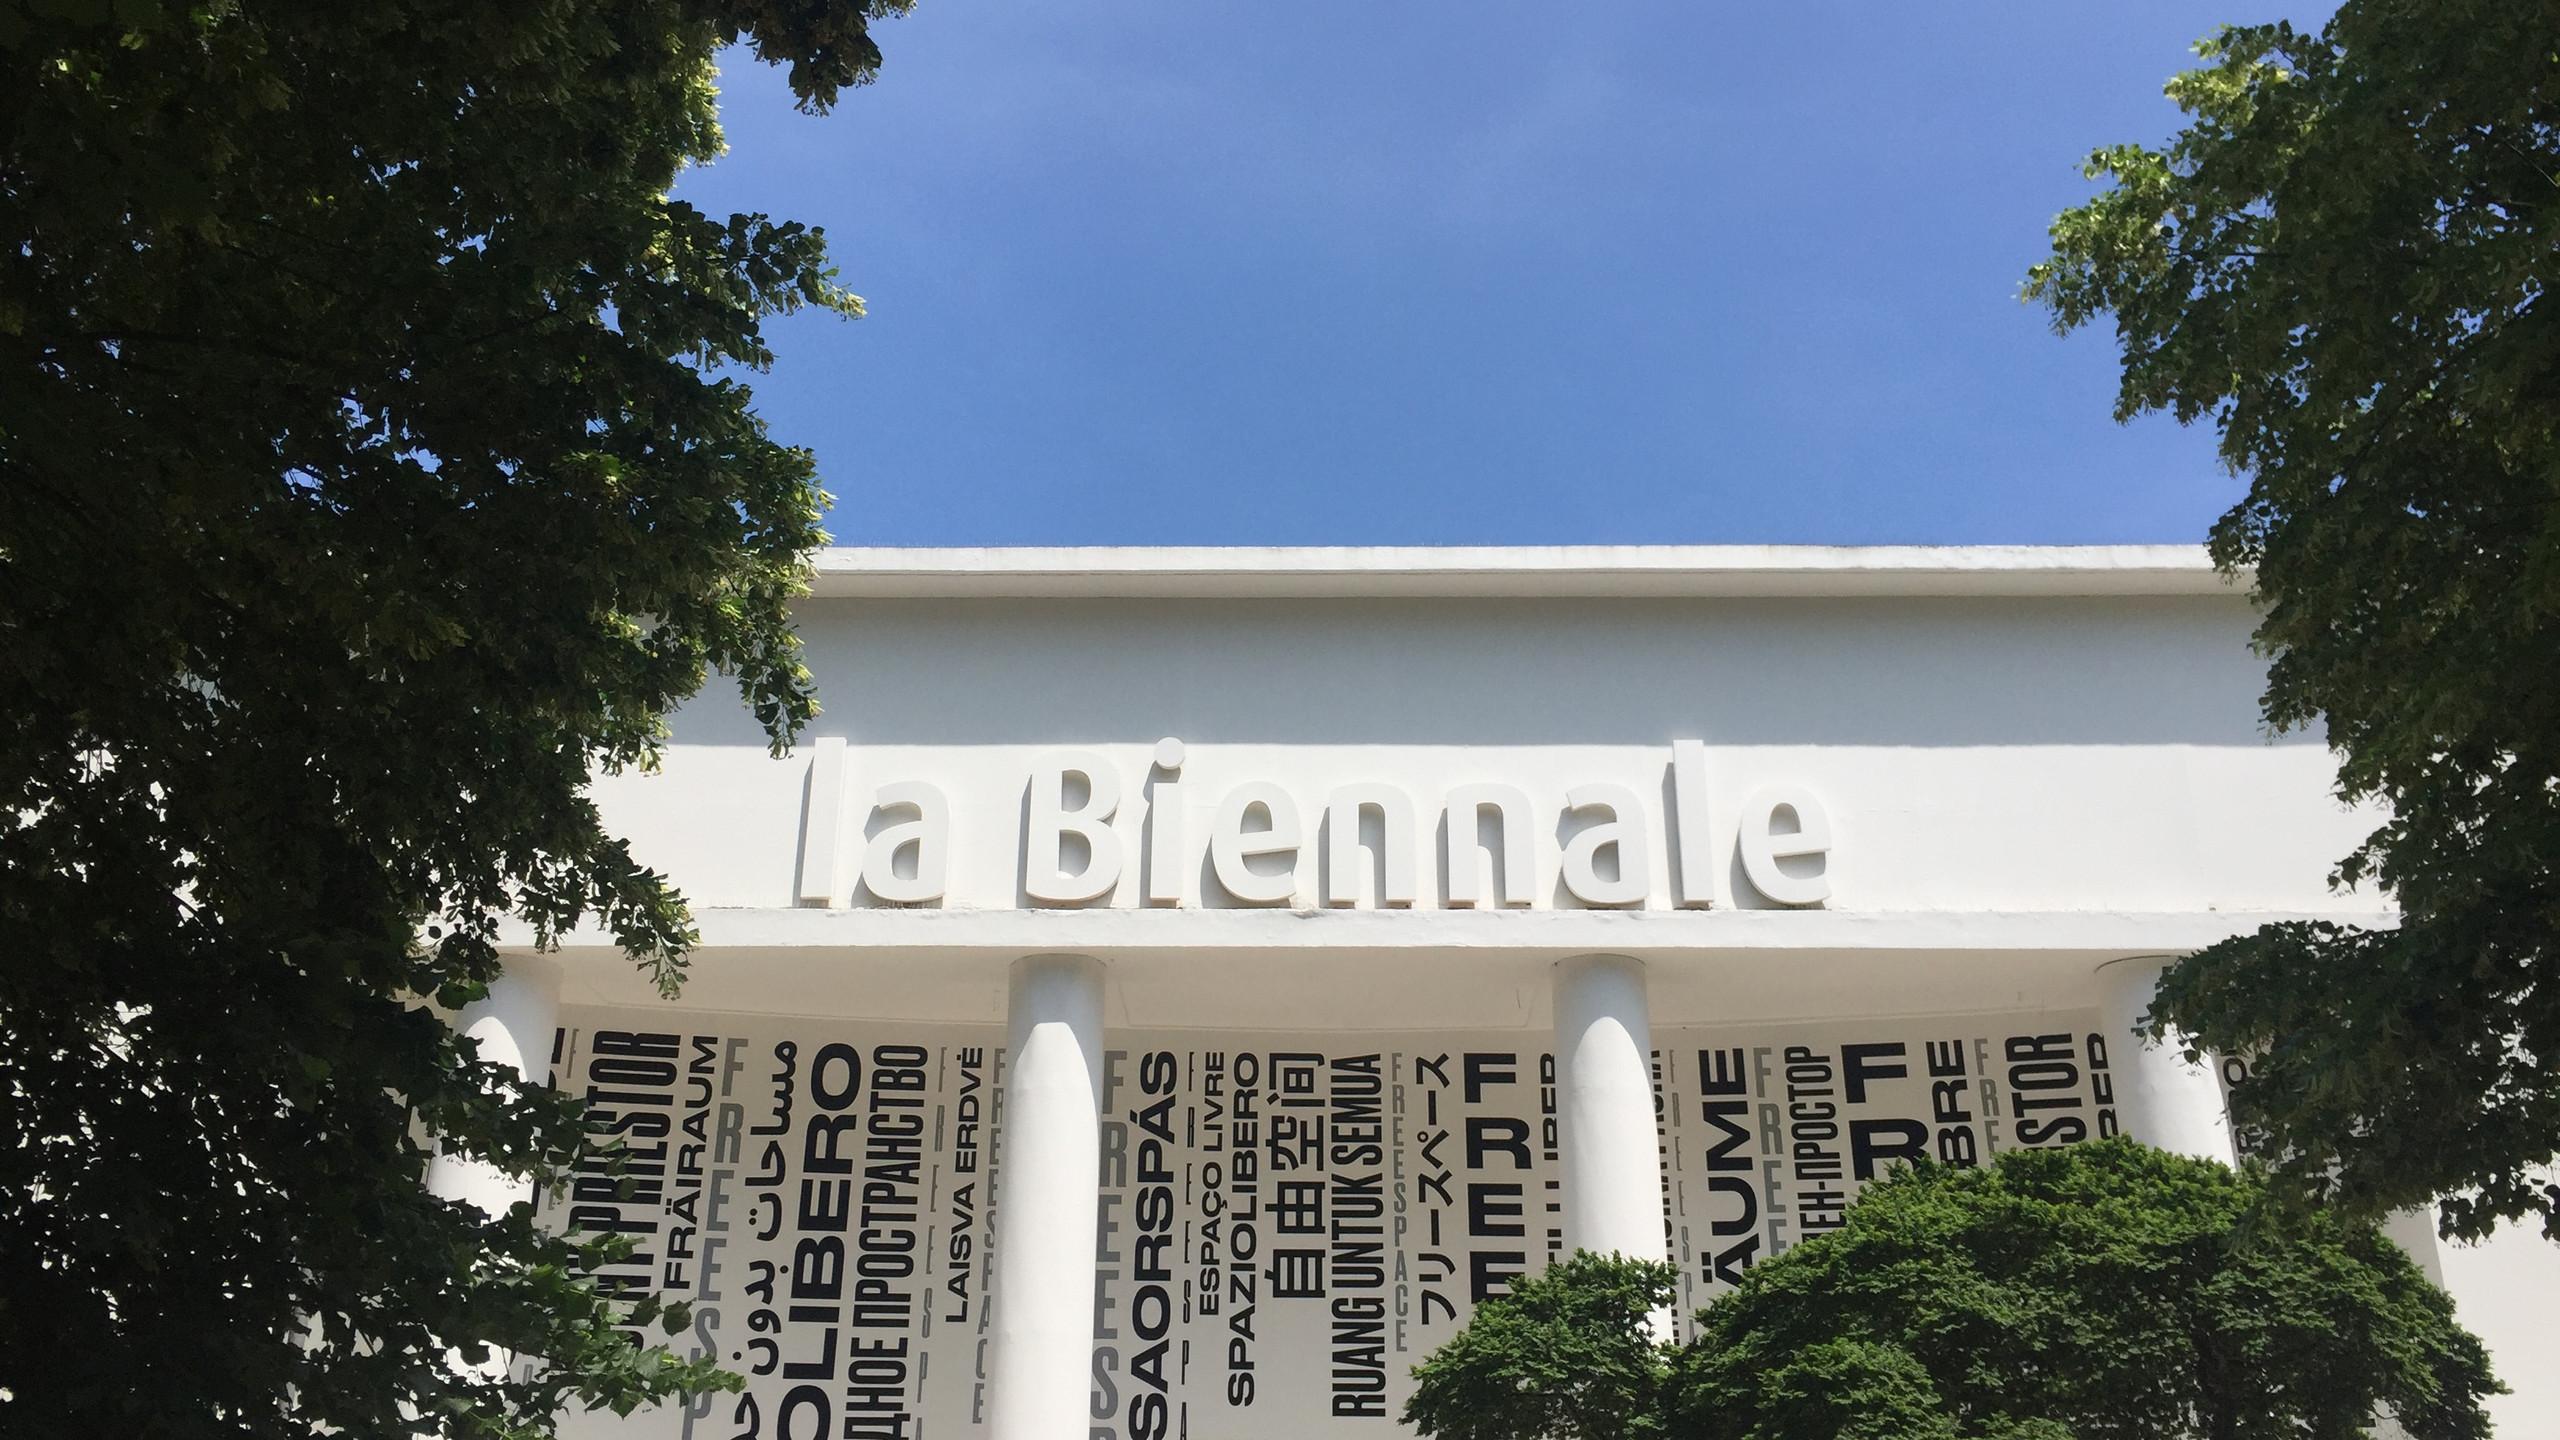 Biennale Pavillon in den Giardini